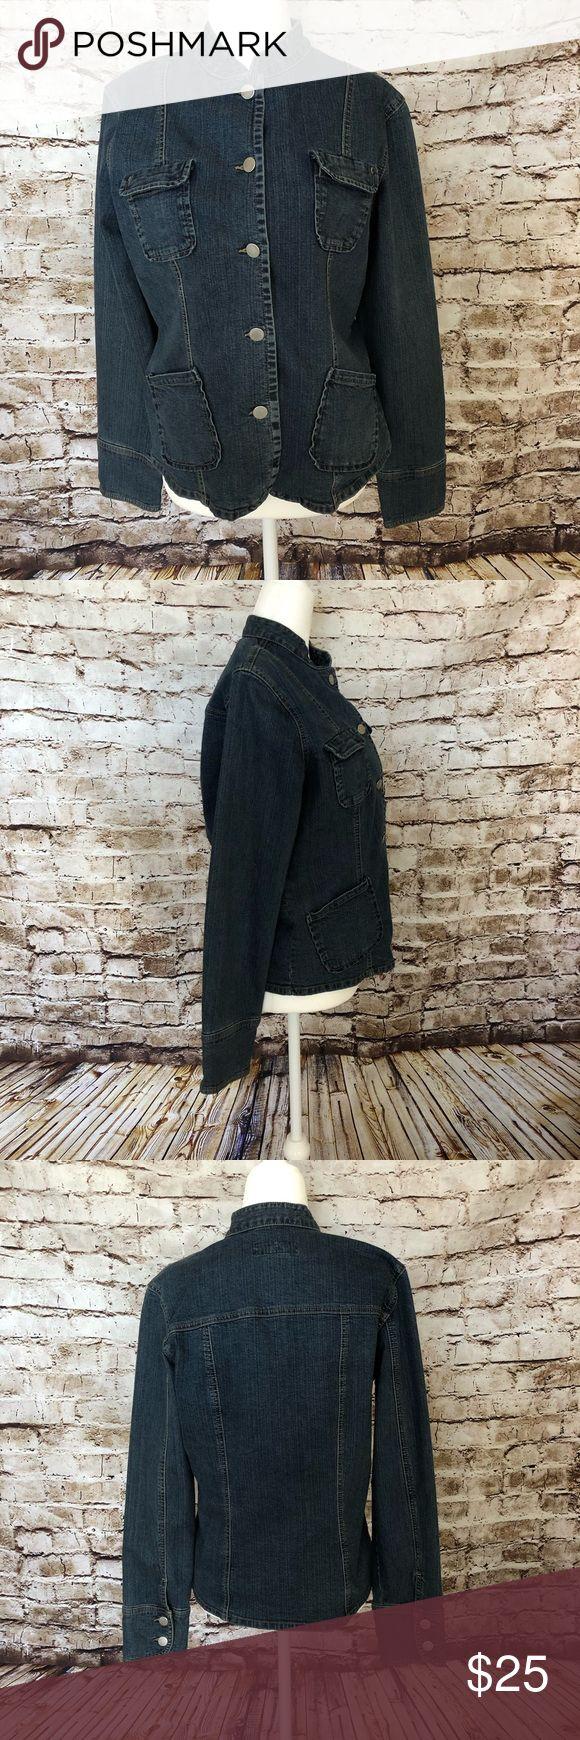 Banana Republic Factory Store Denim Jacket Denim jacket